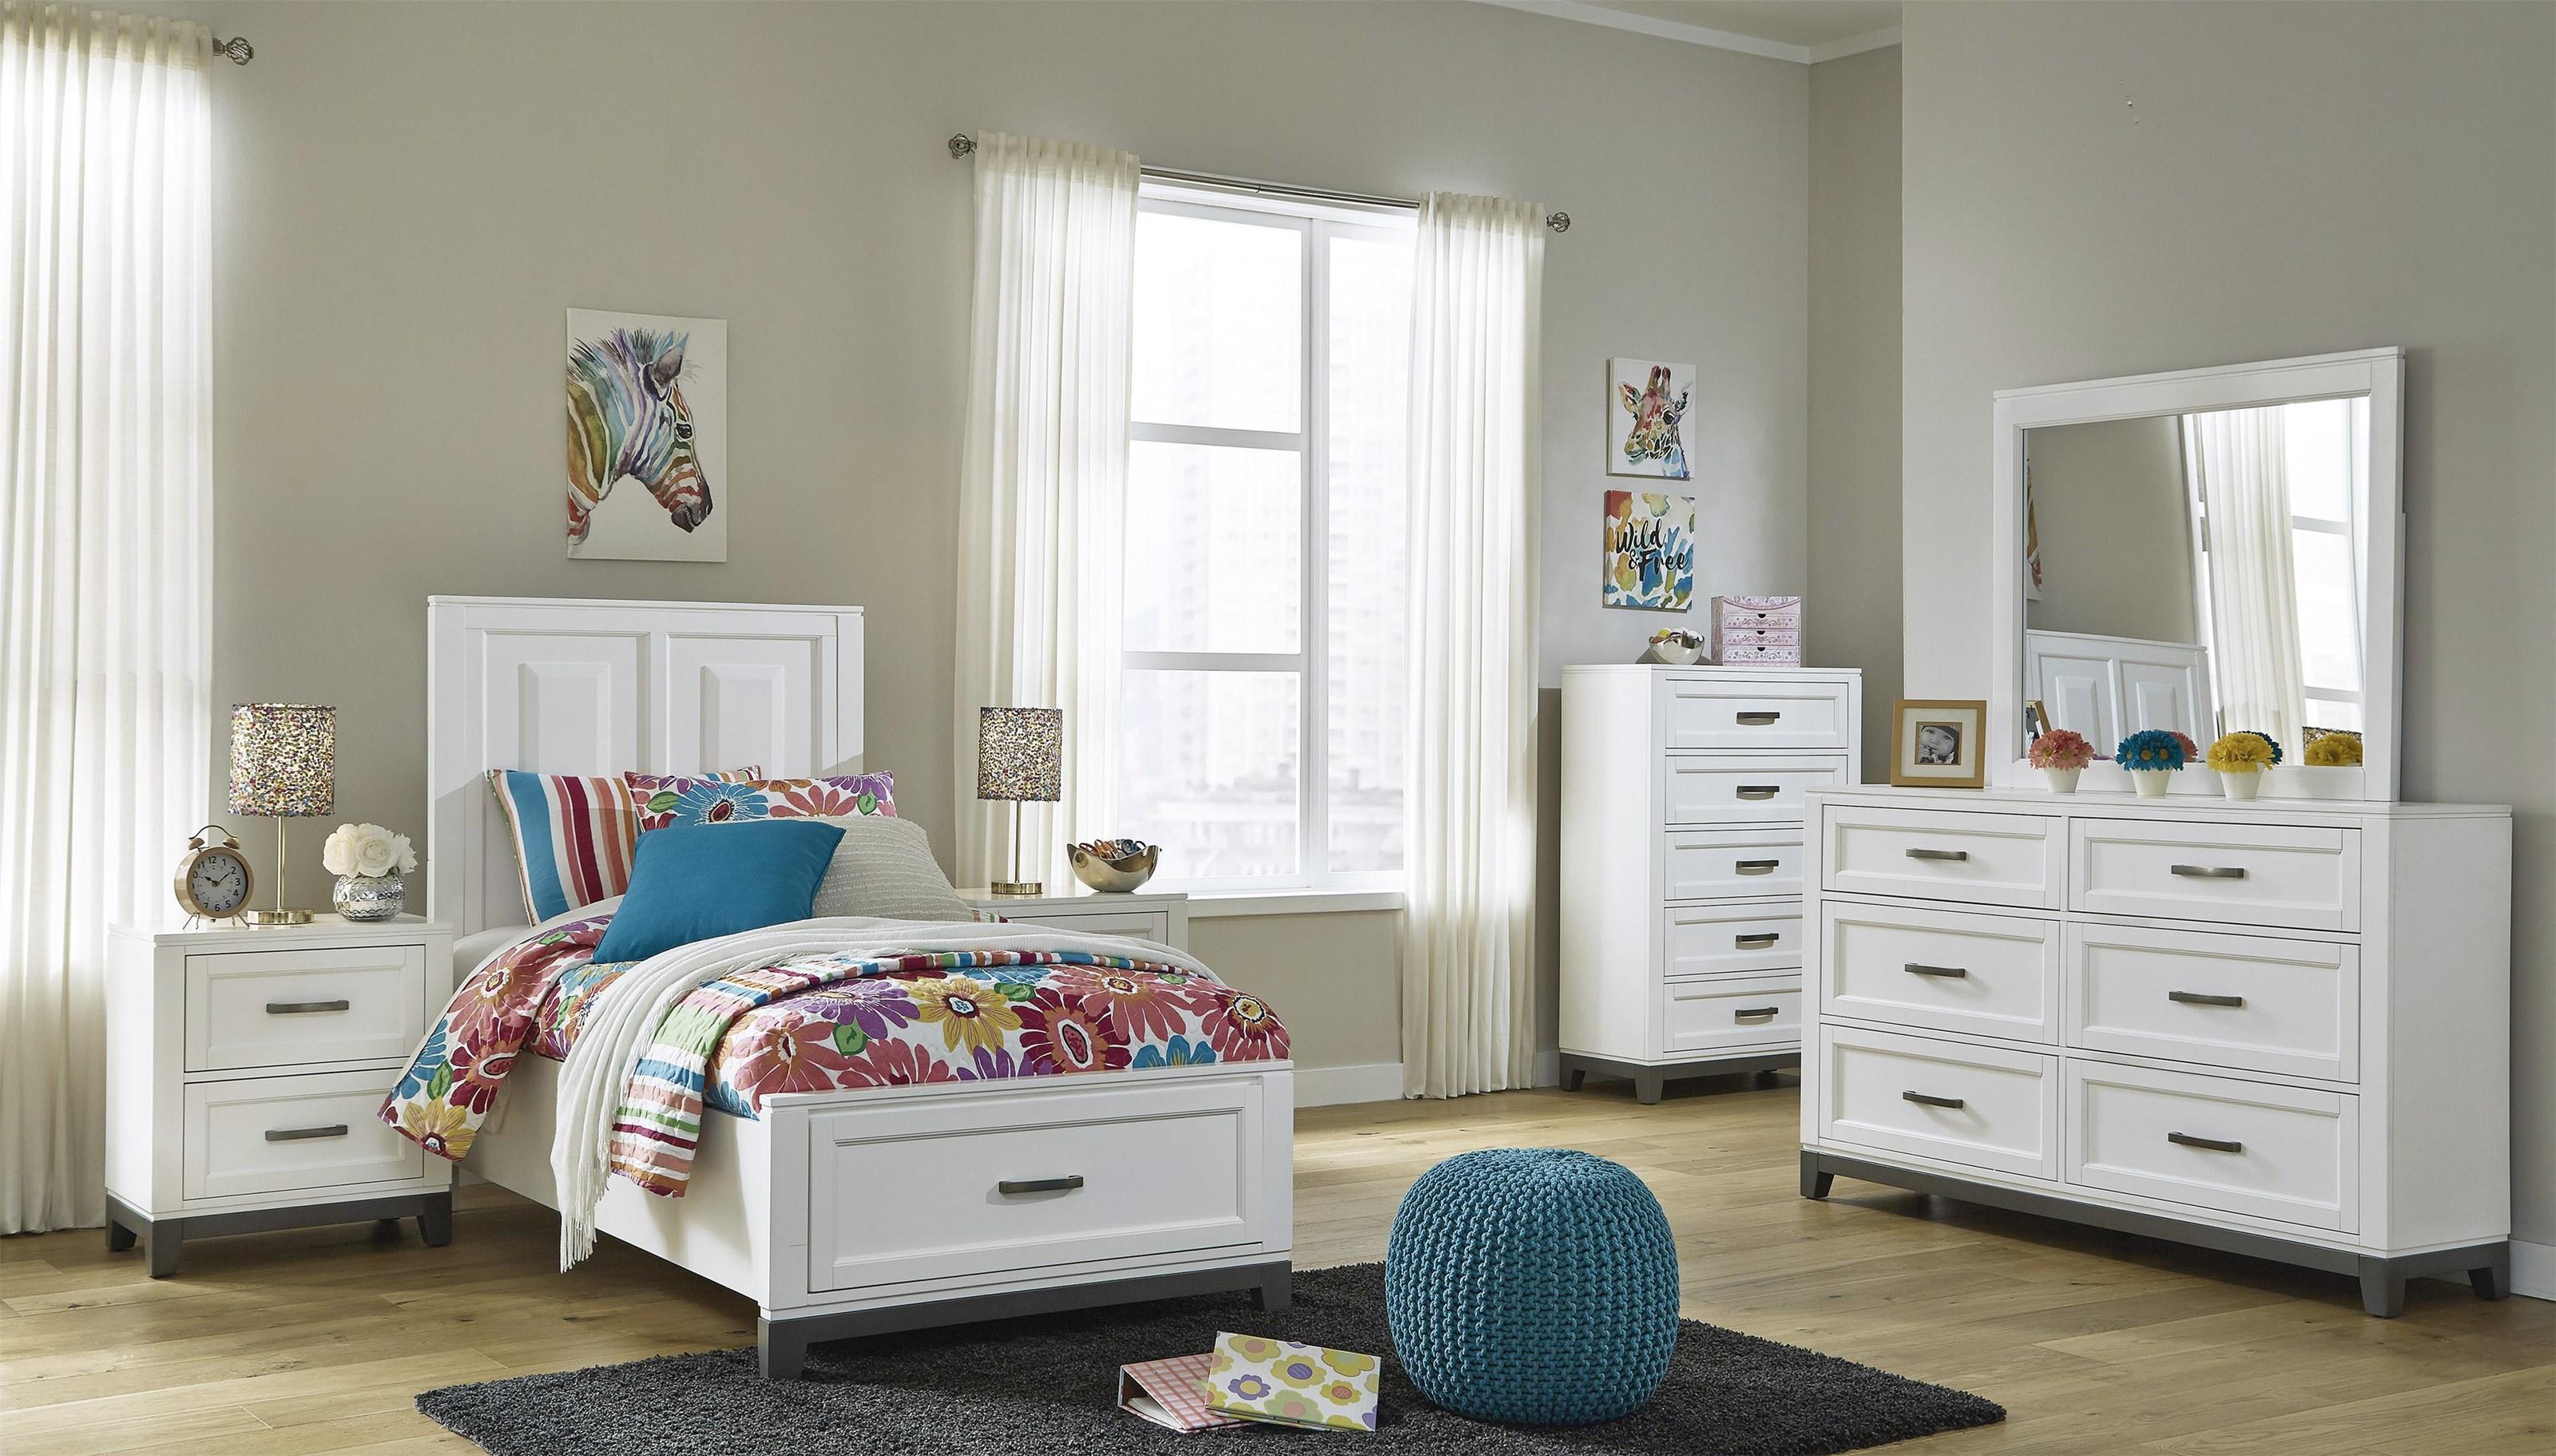 Brynburg 5 Piece Twin Bedroom Set by Benchcraft at Sam Levitz Outlet